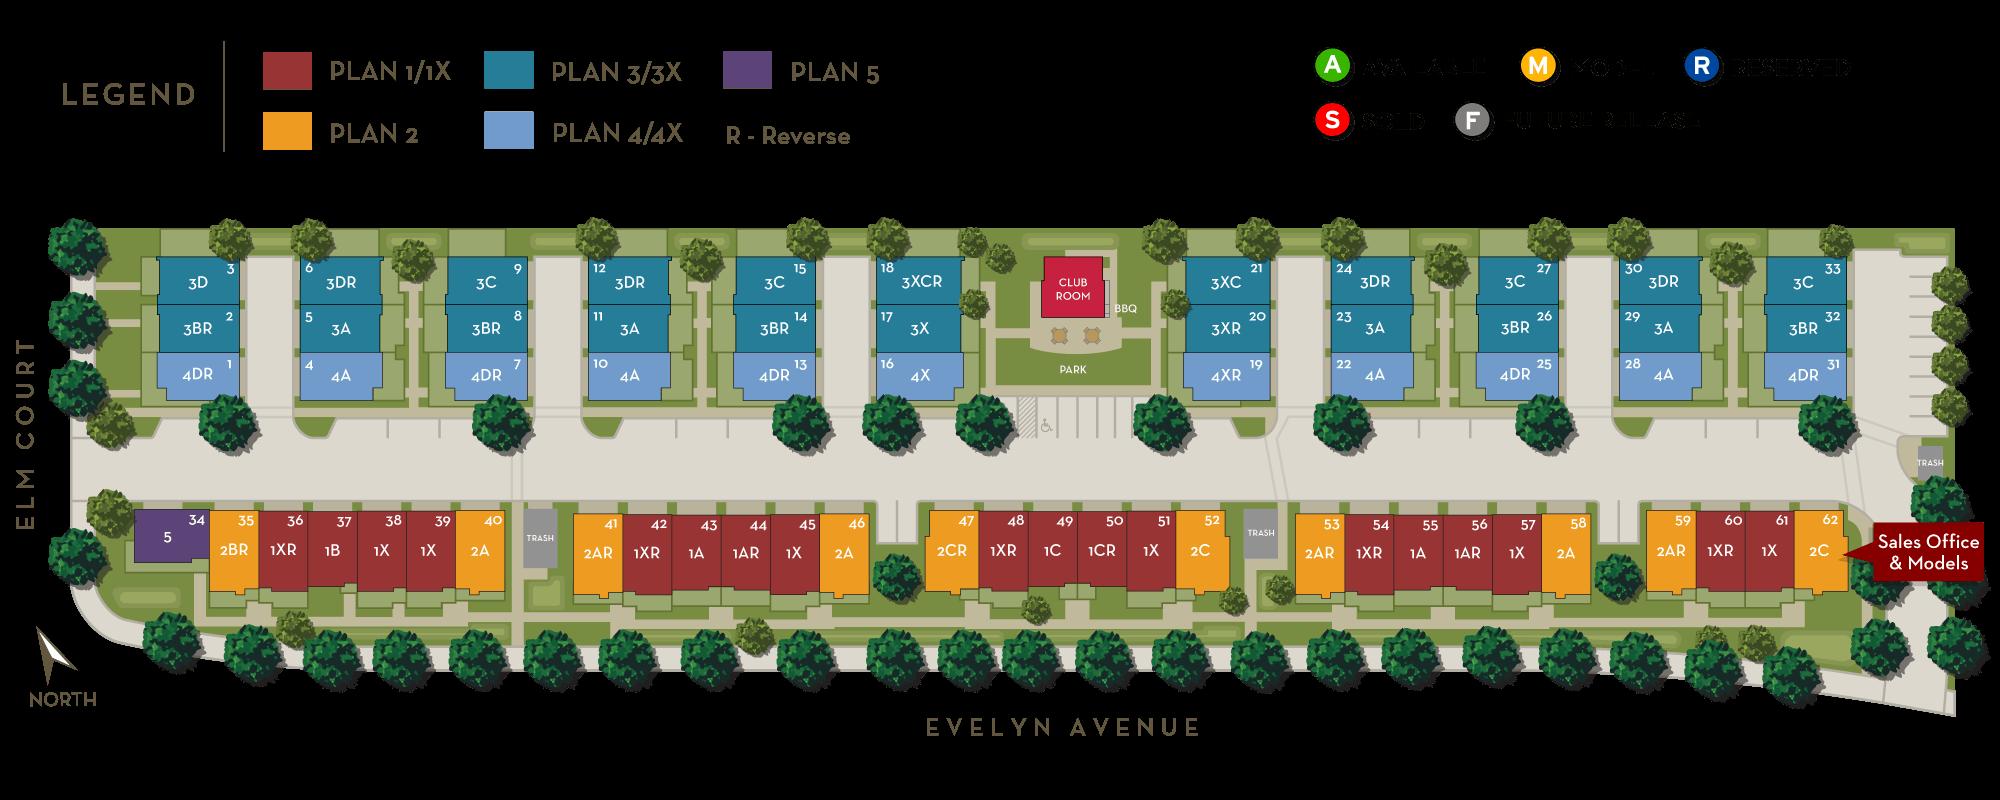 Prism Site Plan